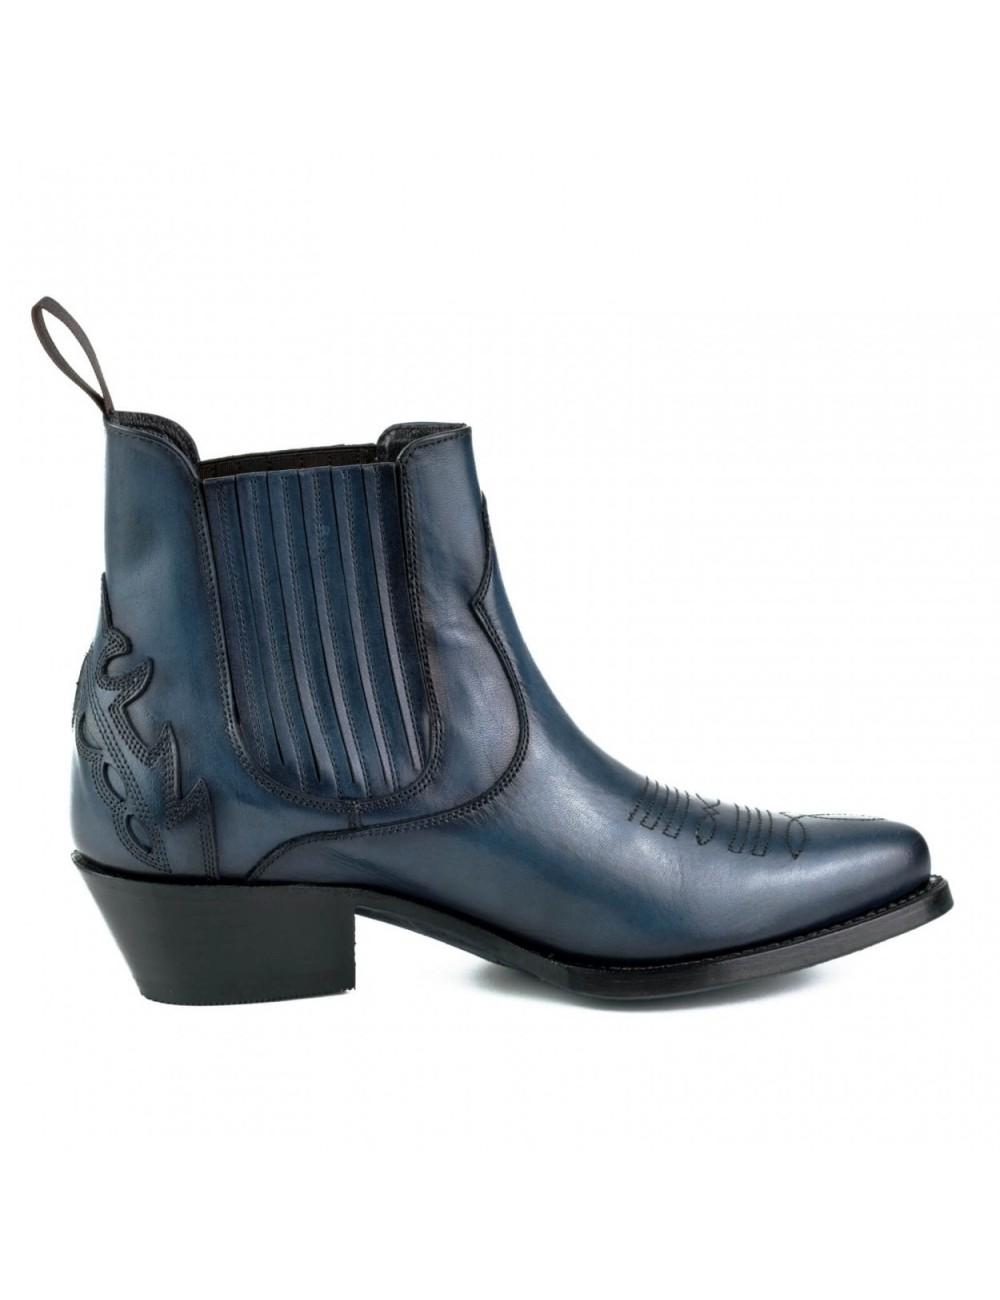 https://latelierdelabotte.com/7978-large_default/bottines-femme-bleu-marine-cuir.jpg